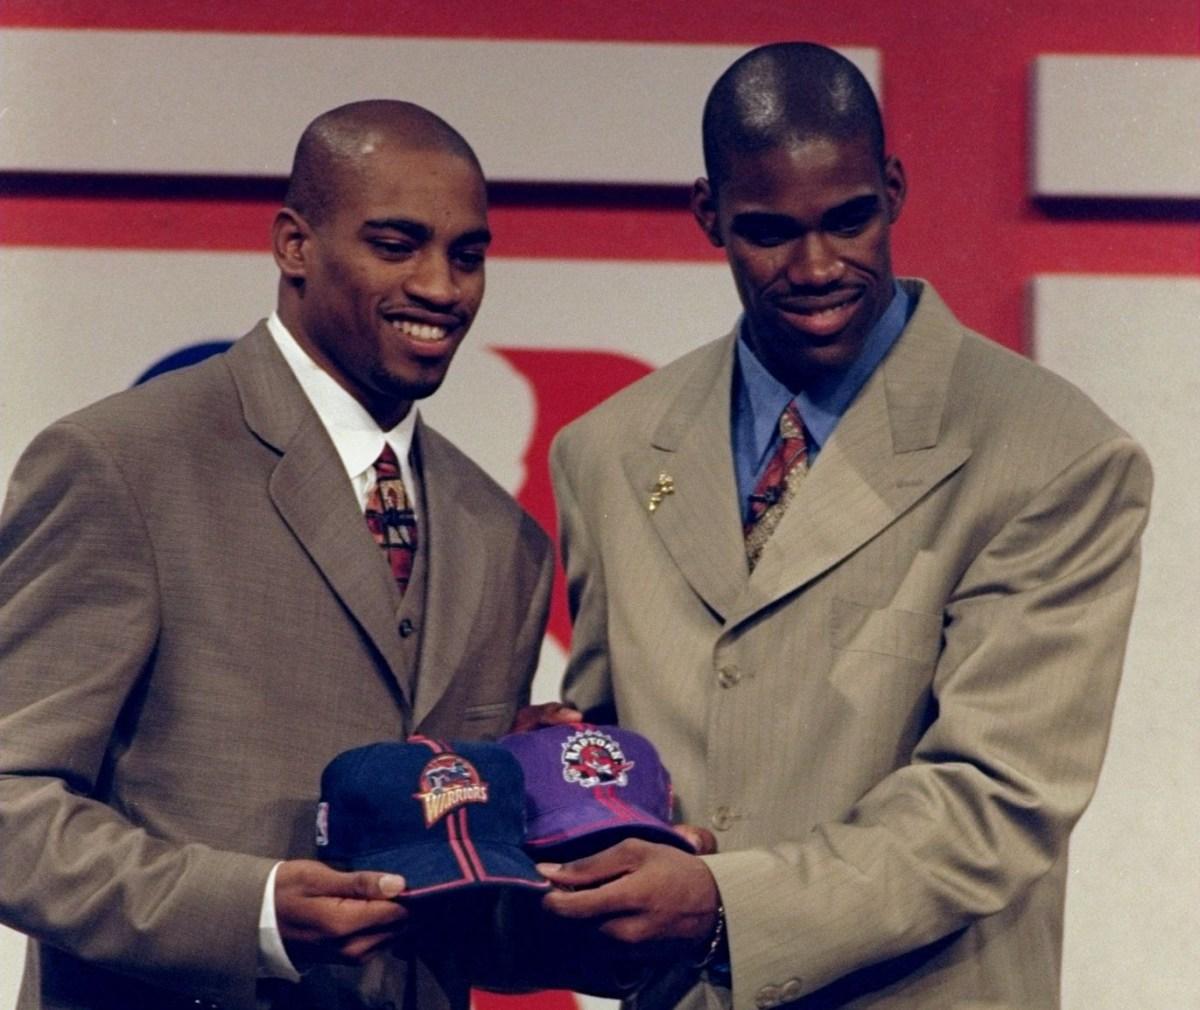 Vince Carter and Antawn Jamison, Draft